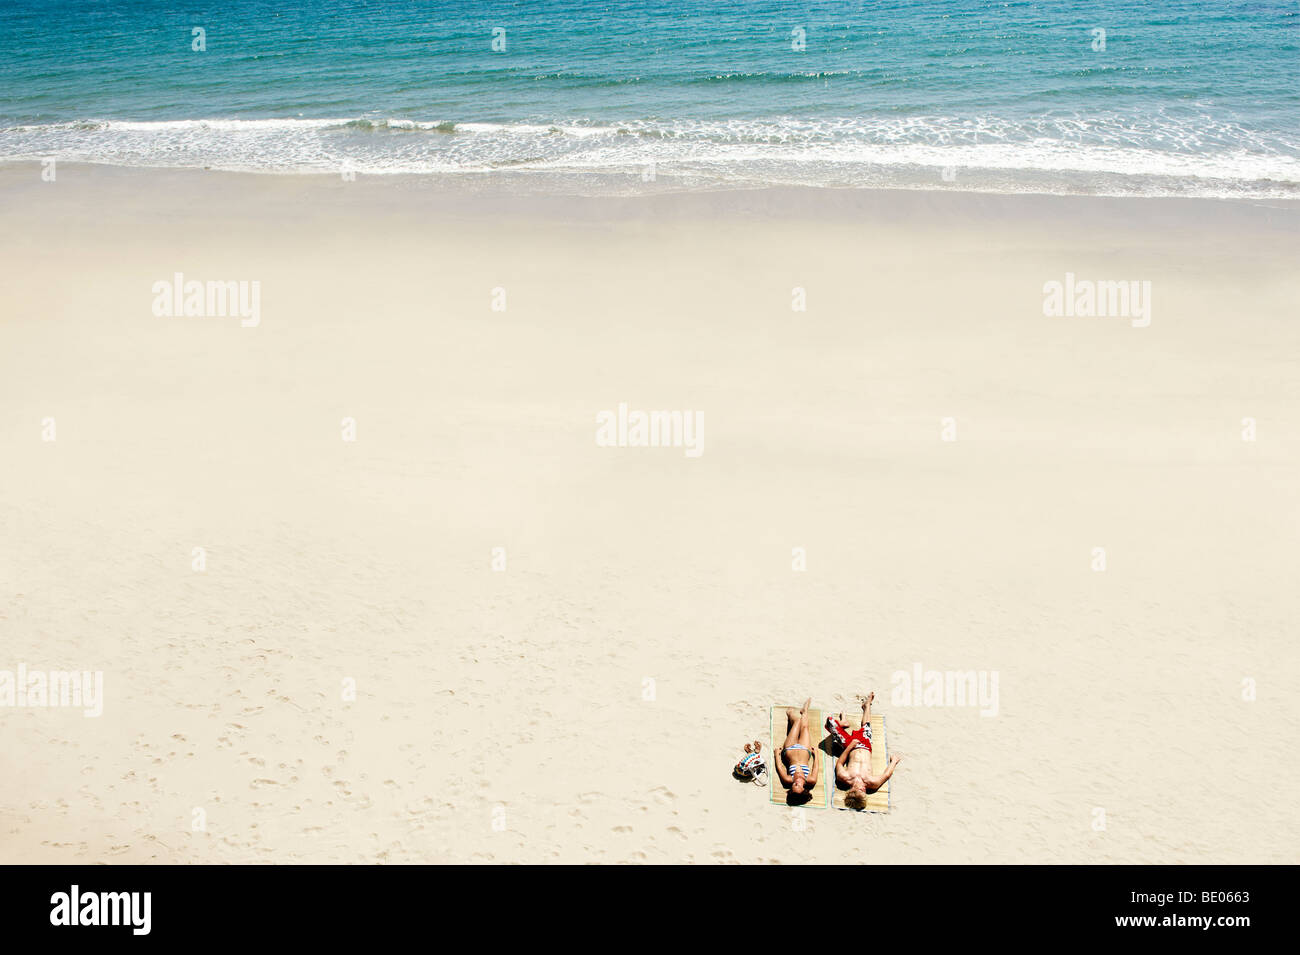 Couple sunbathing on white sandy beach - Stock Image